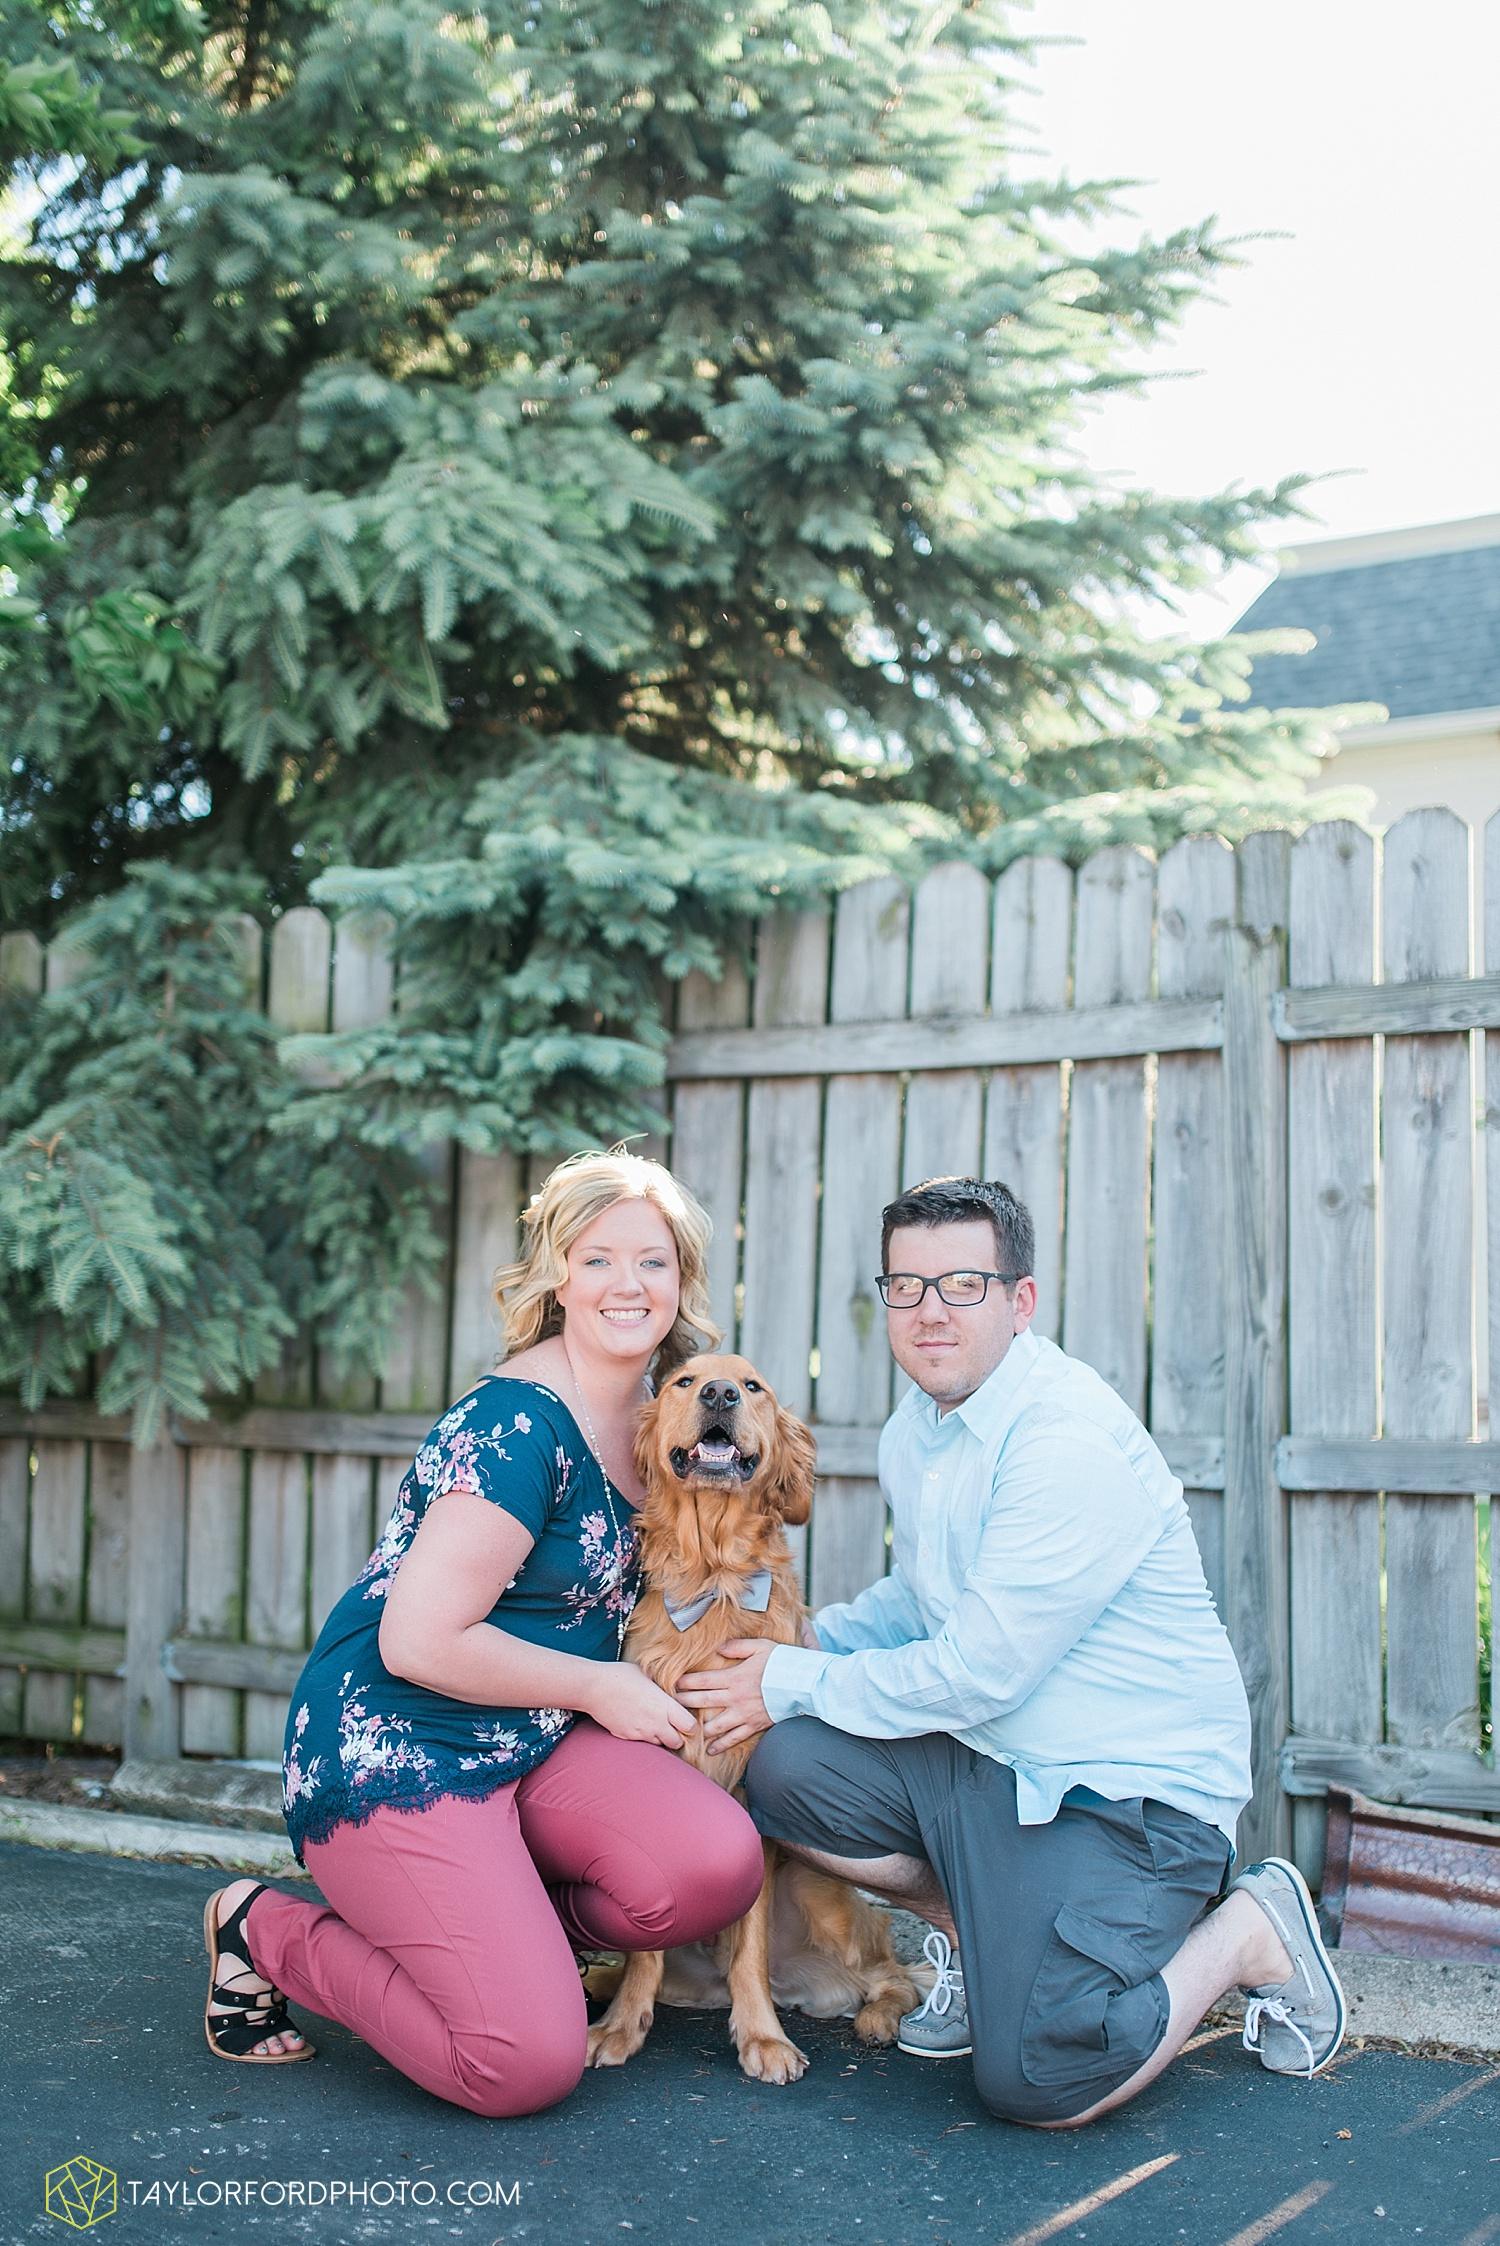 van-wert-ohio-engagement-photographer-taylor-ford-photography_2453.jpg